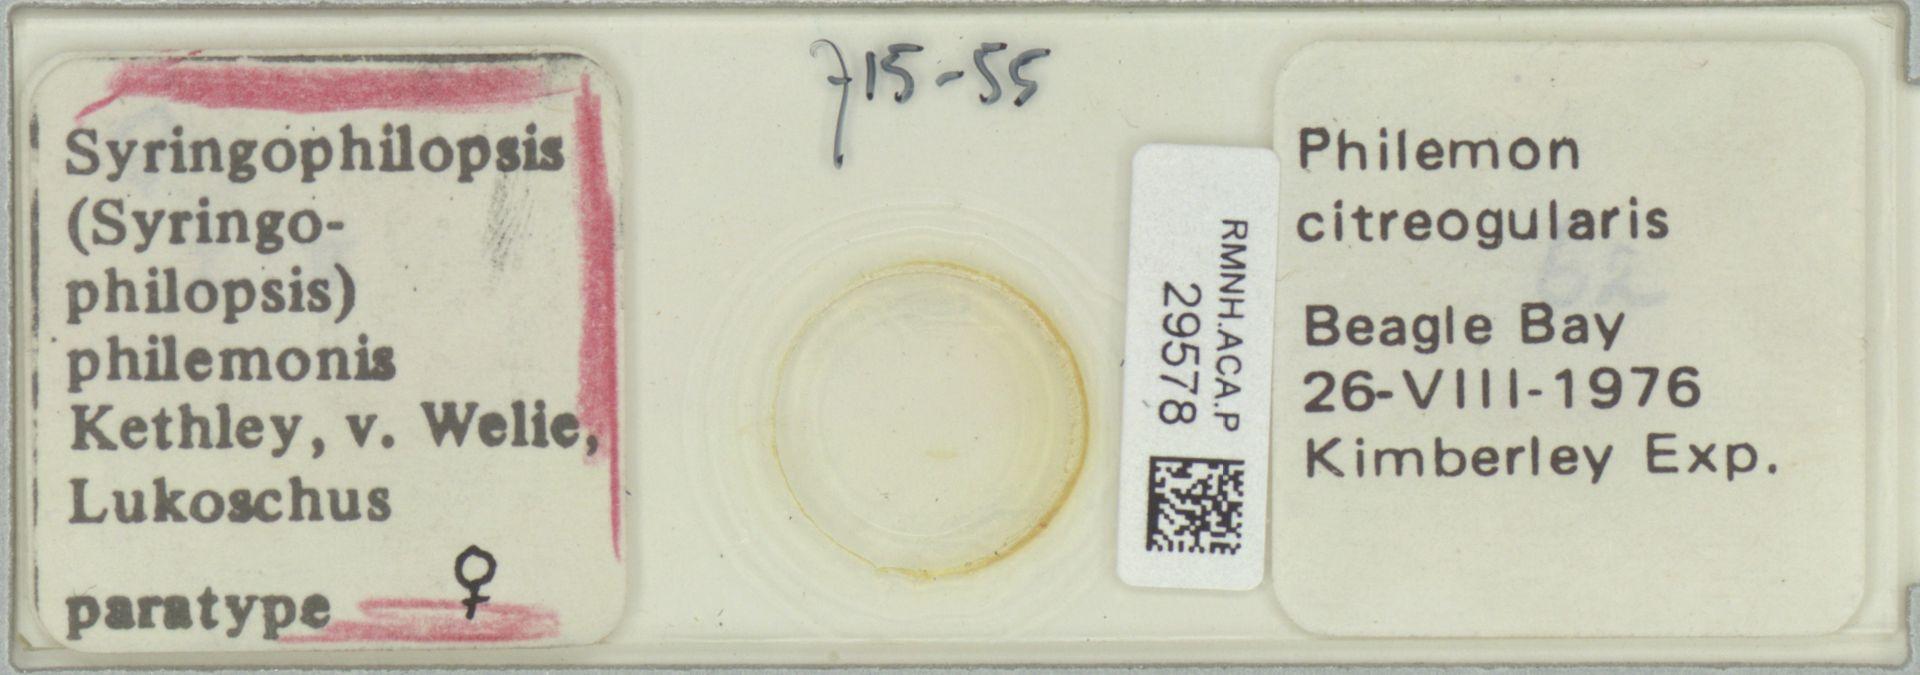 RMNH.ACA.P.29578   Syringophilopsis (Syringophilopsis) philemonis Kethley, v. Welie, Lukoschus